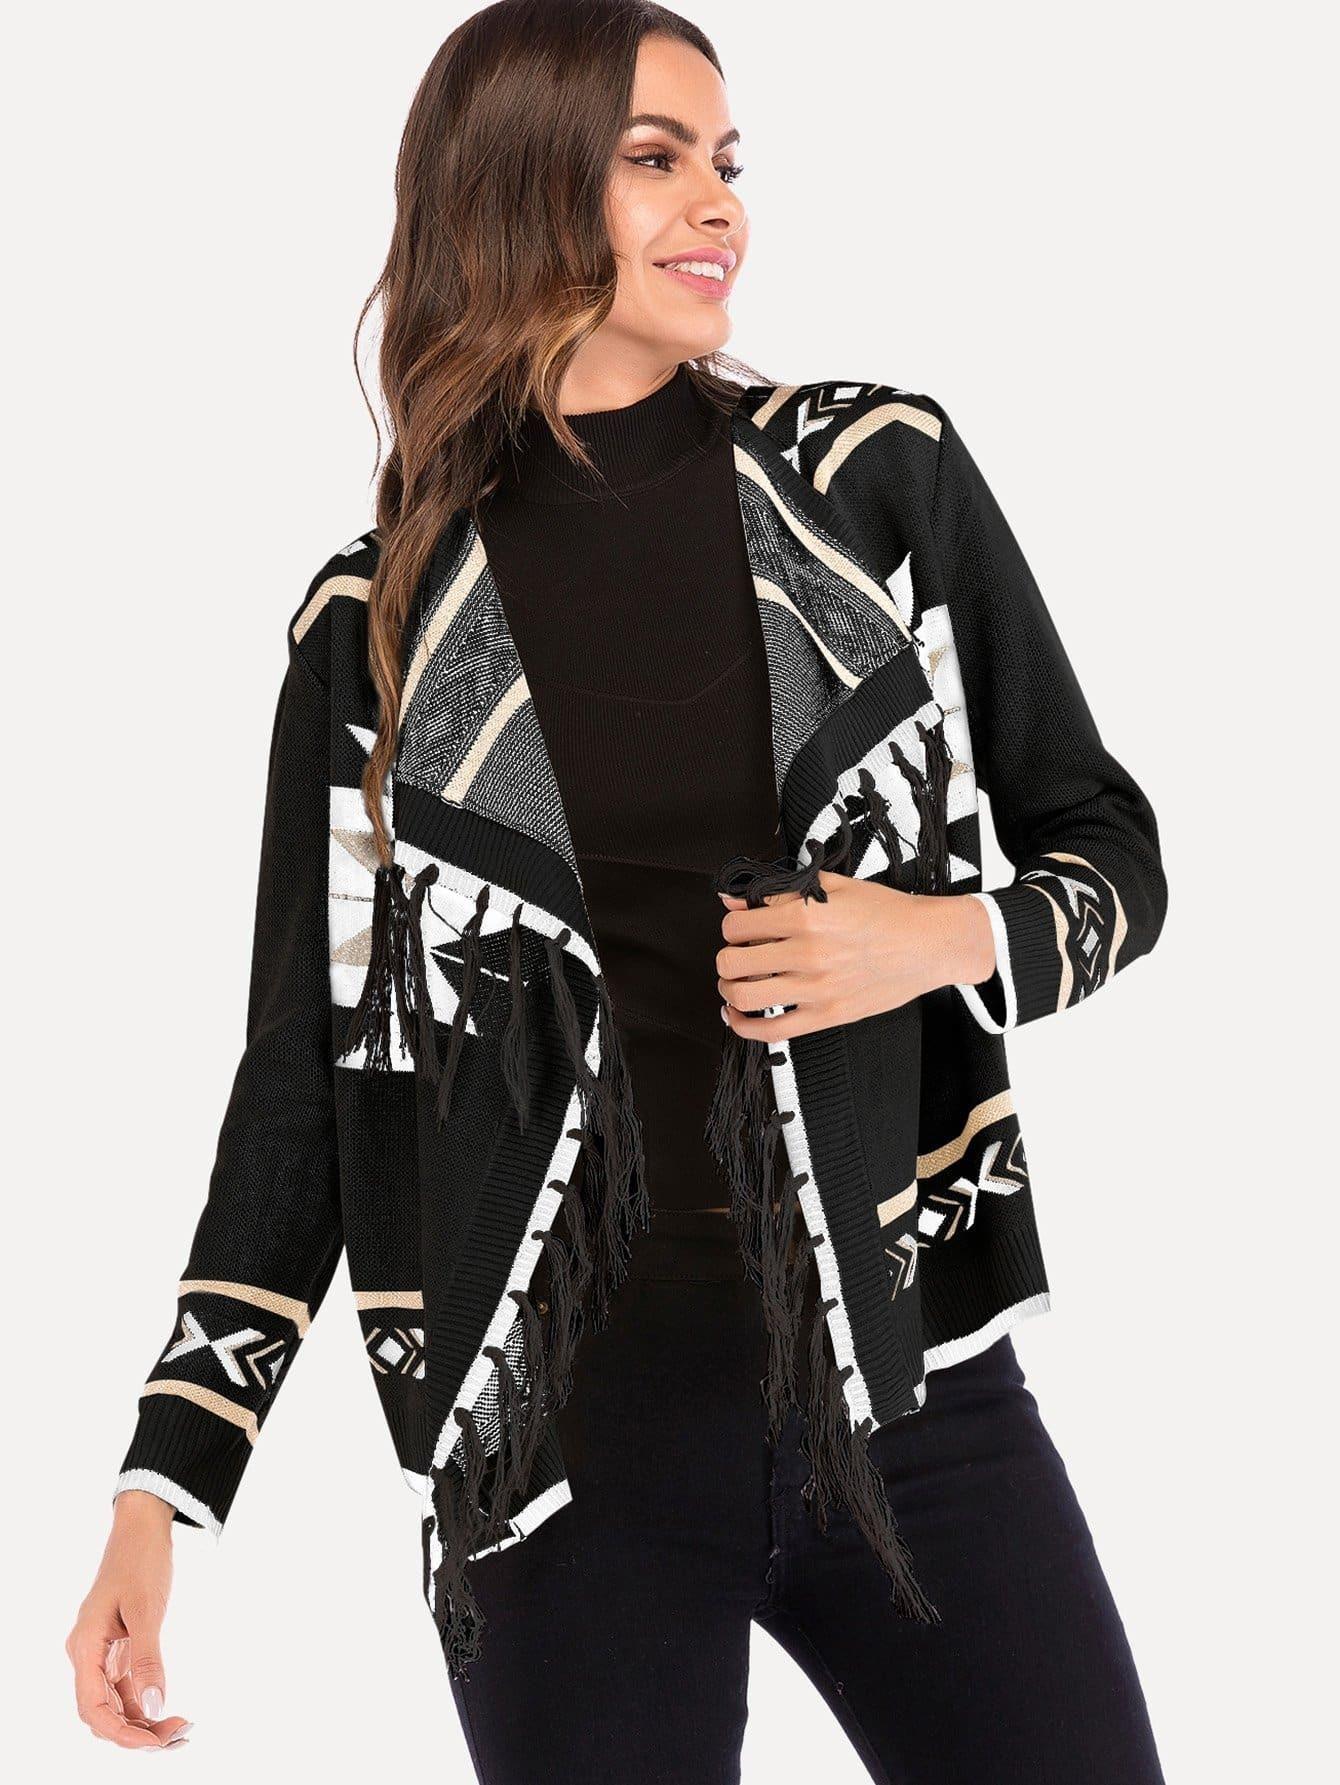 Fringe Detail Geometric Print Sweater infiniti очки солнцезащитные